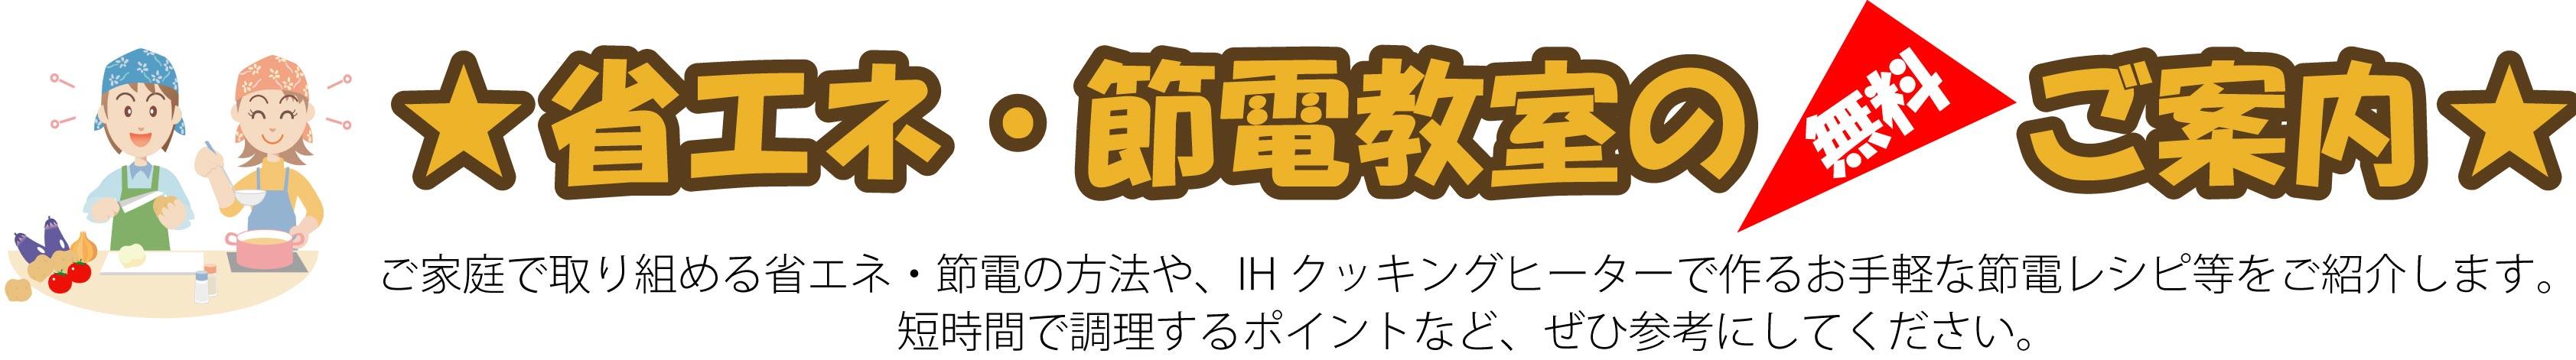 KuraSi-natu-sin74-12.jpg